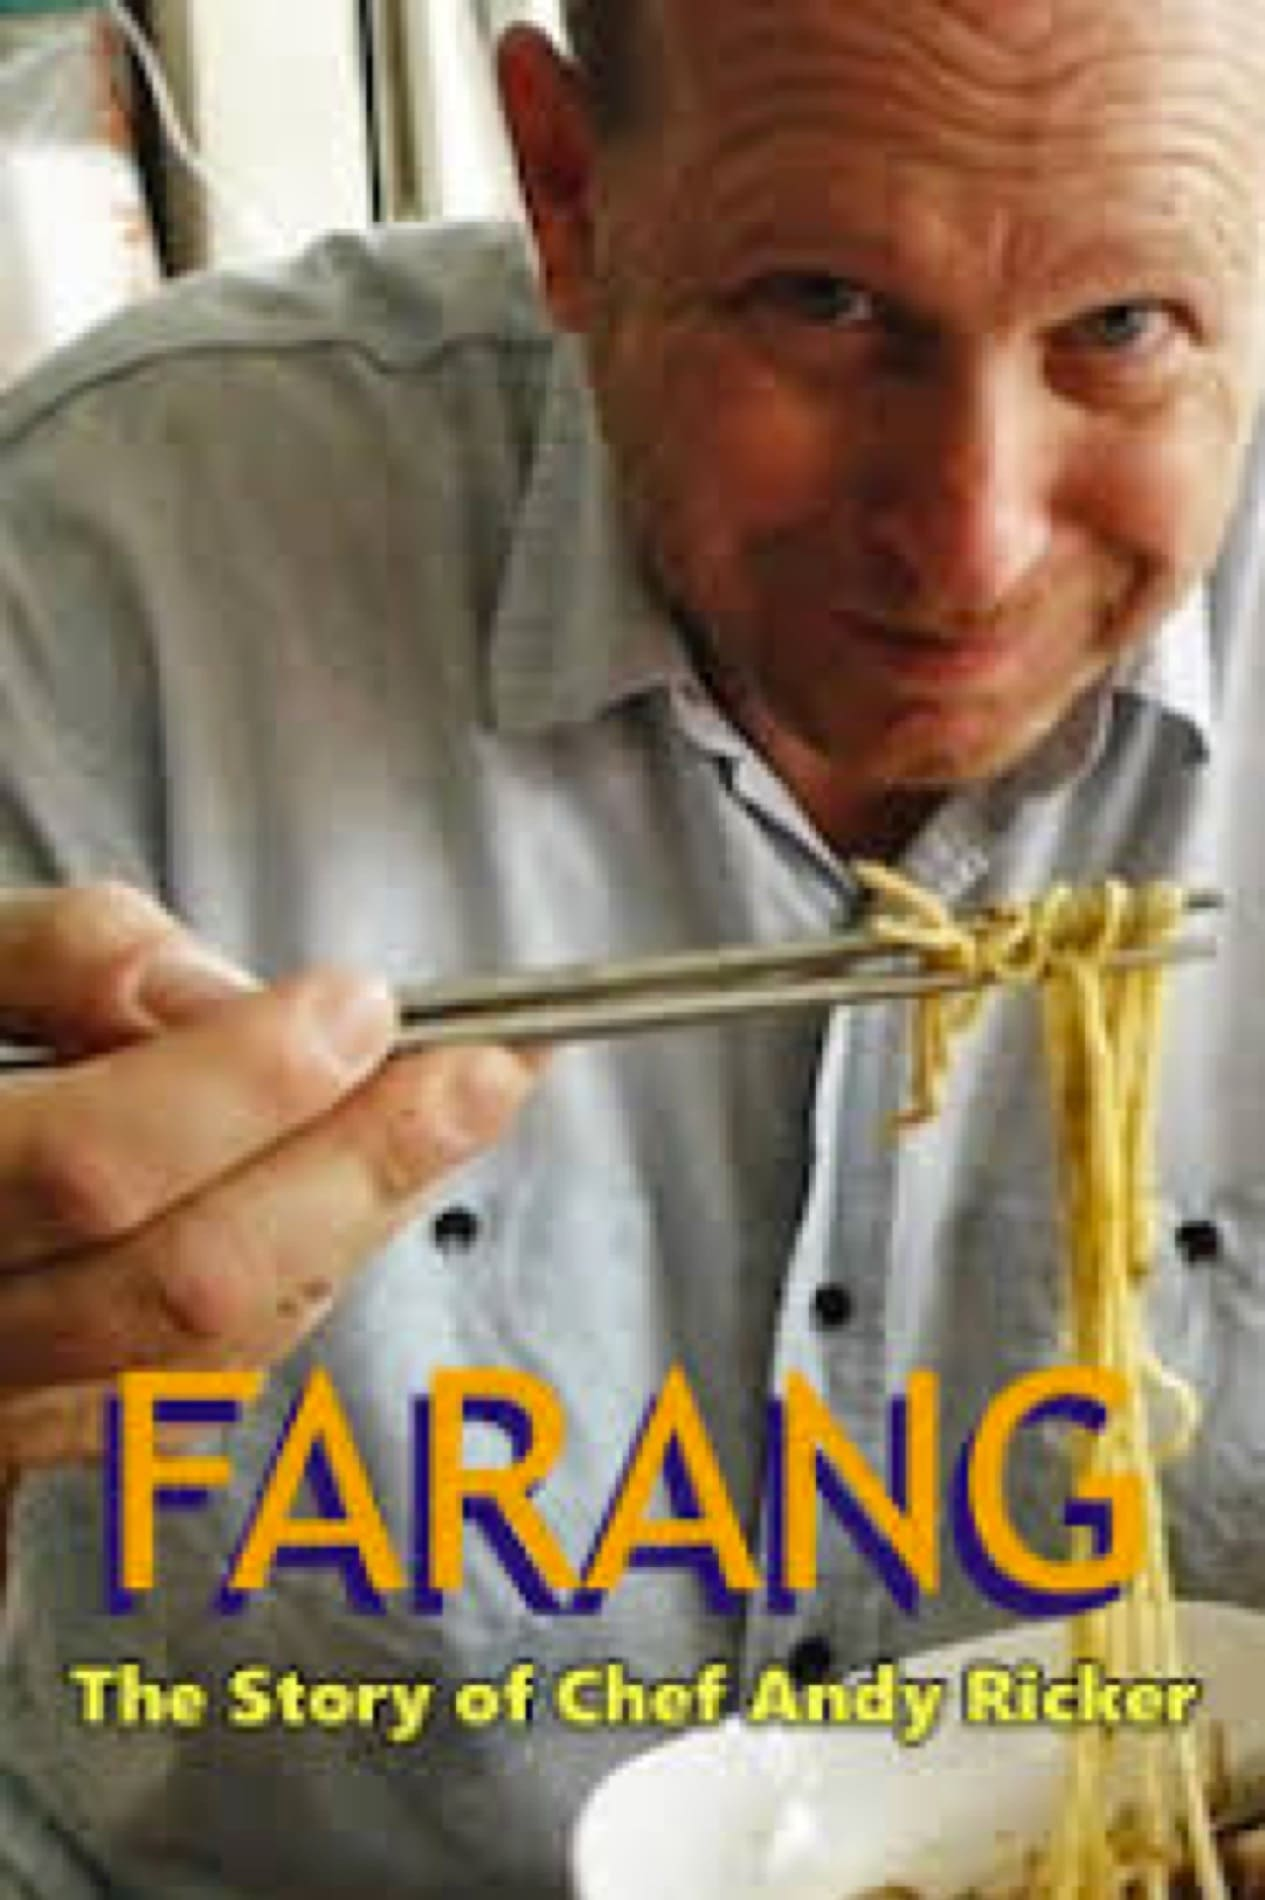 FARANG: The Story of Chef Andy Ricker of Pok Pok Thai Empire (1970)